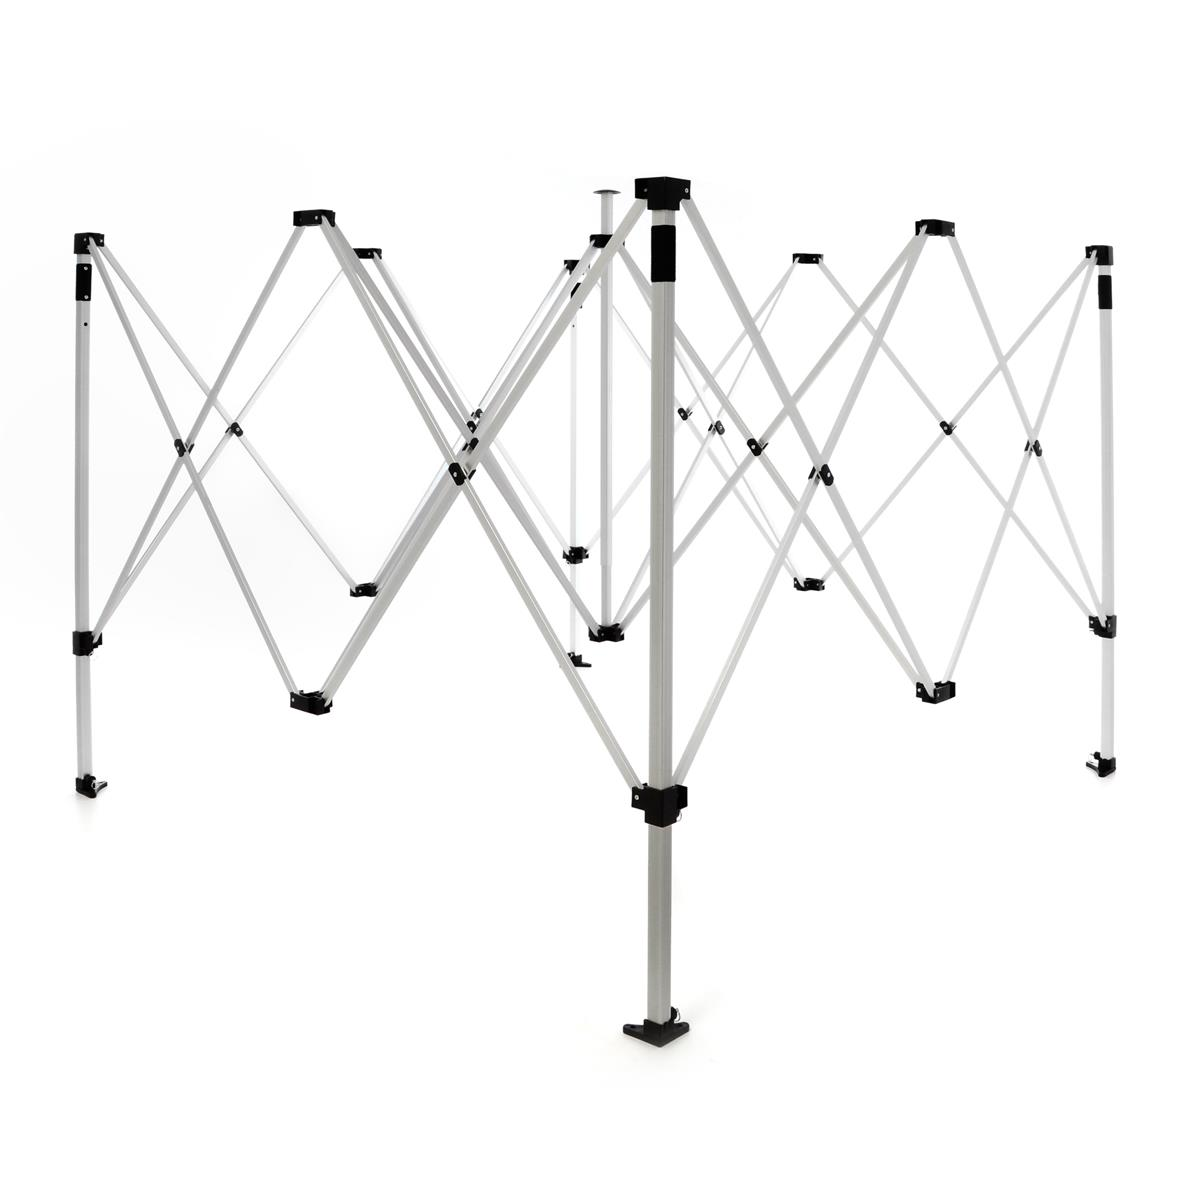 Faltpavillon Alu Rahmen Profi 3 x 3m Gestell Falt Pavillon inkl. Tragetasche